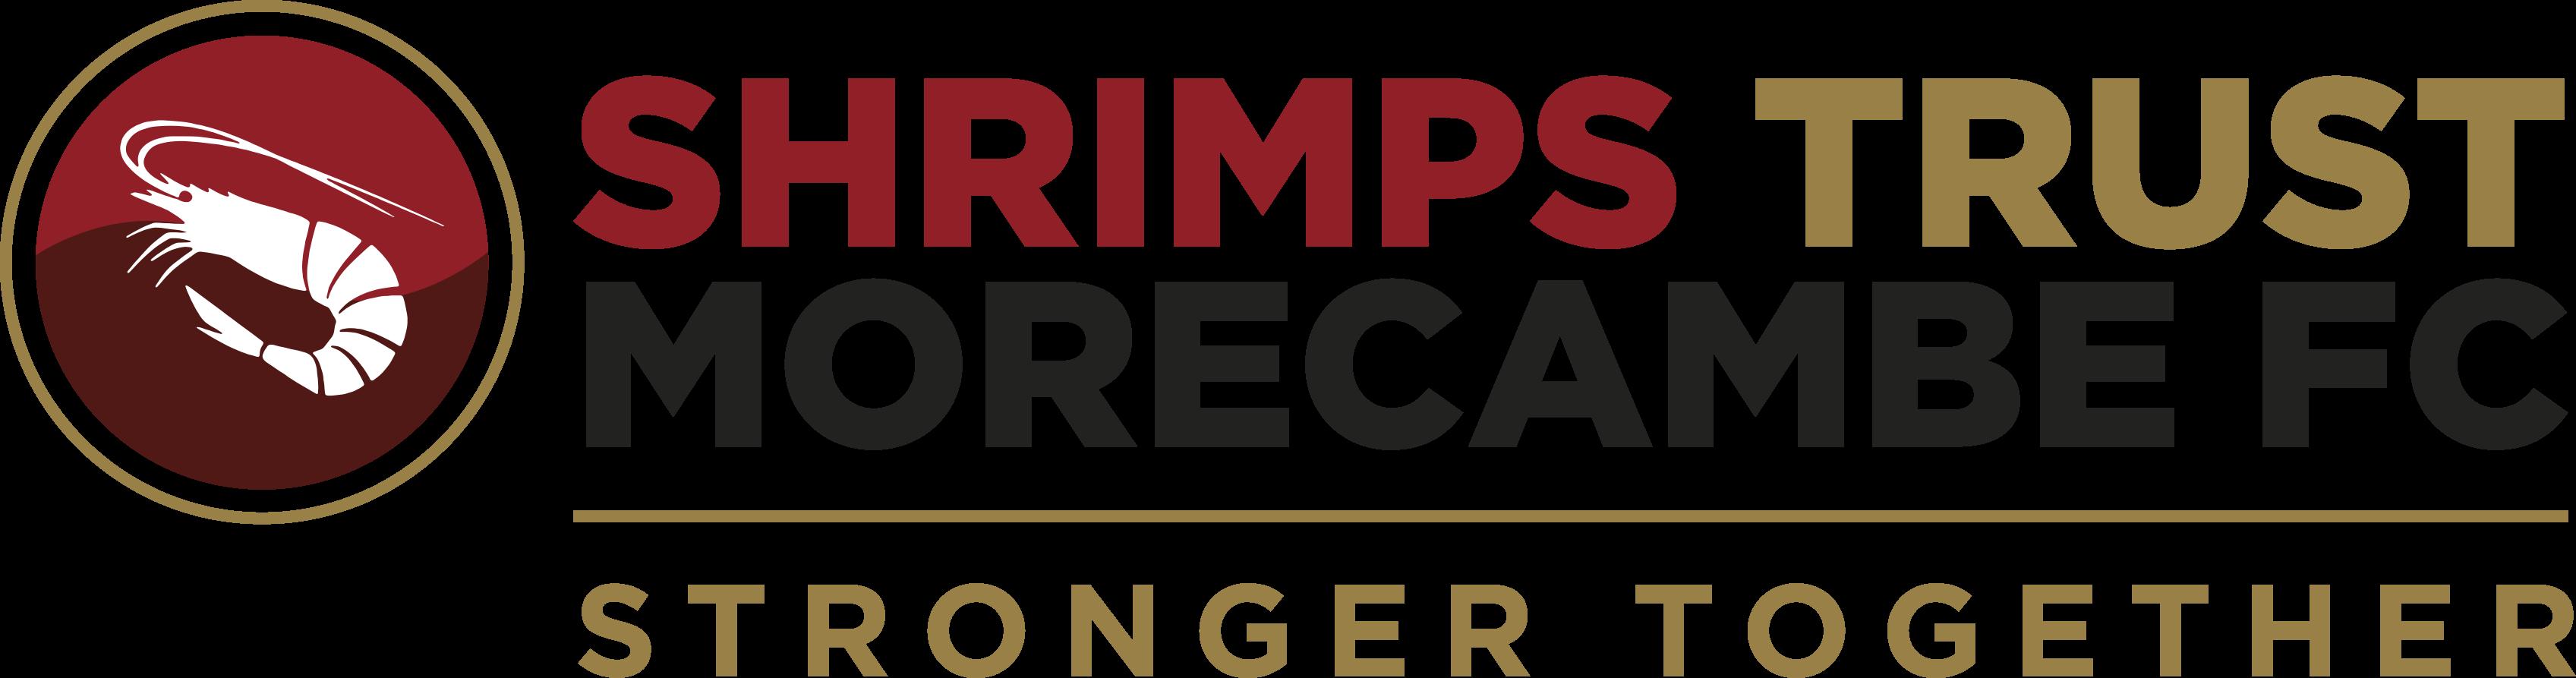 Home | Shrimps Trust Morecambe FC